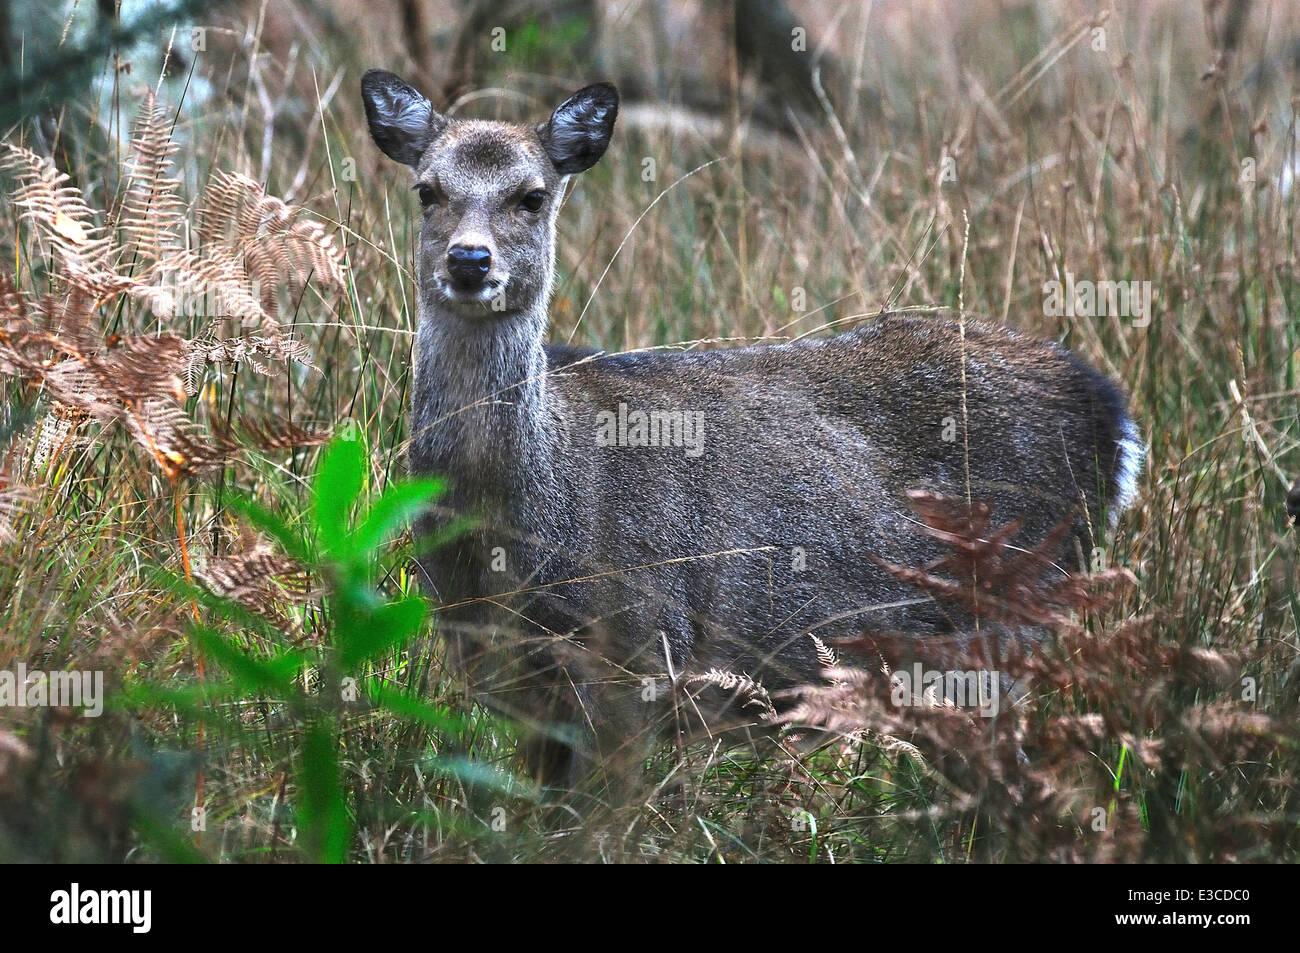 Sika deer cervus nippon mammifero mammiferi animali animali selvatici natura della fauna selvatica Immagini Stock